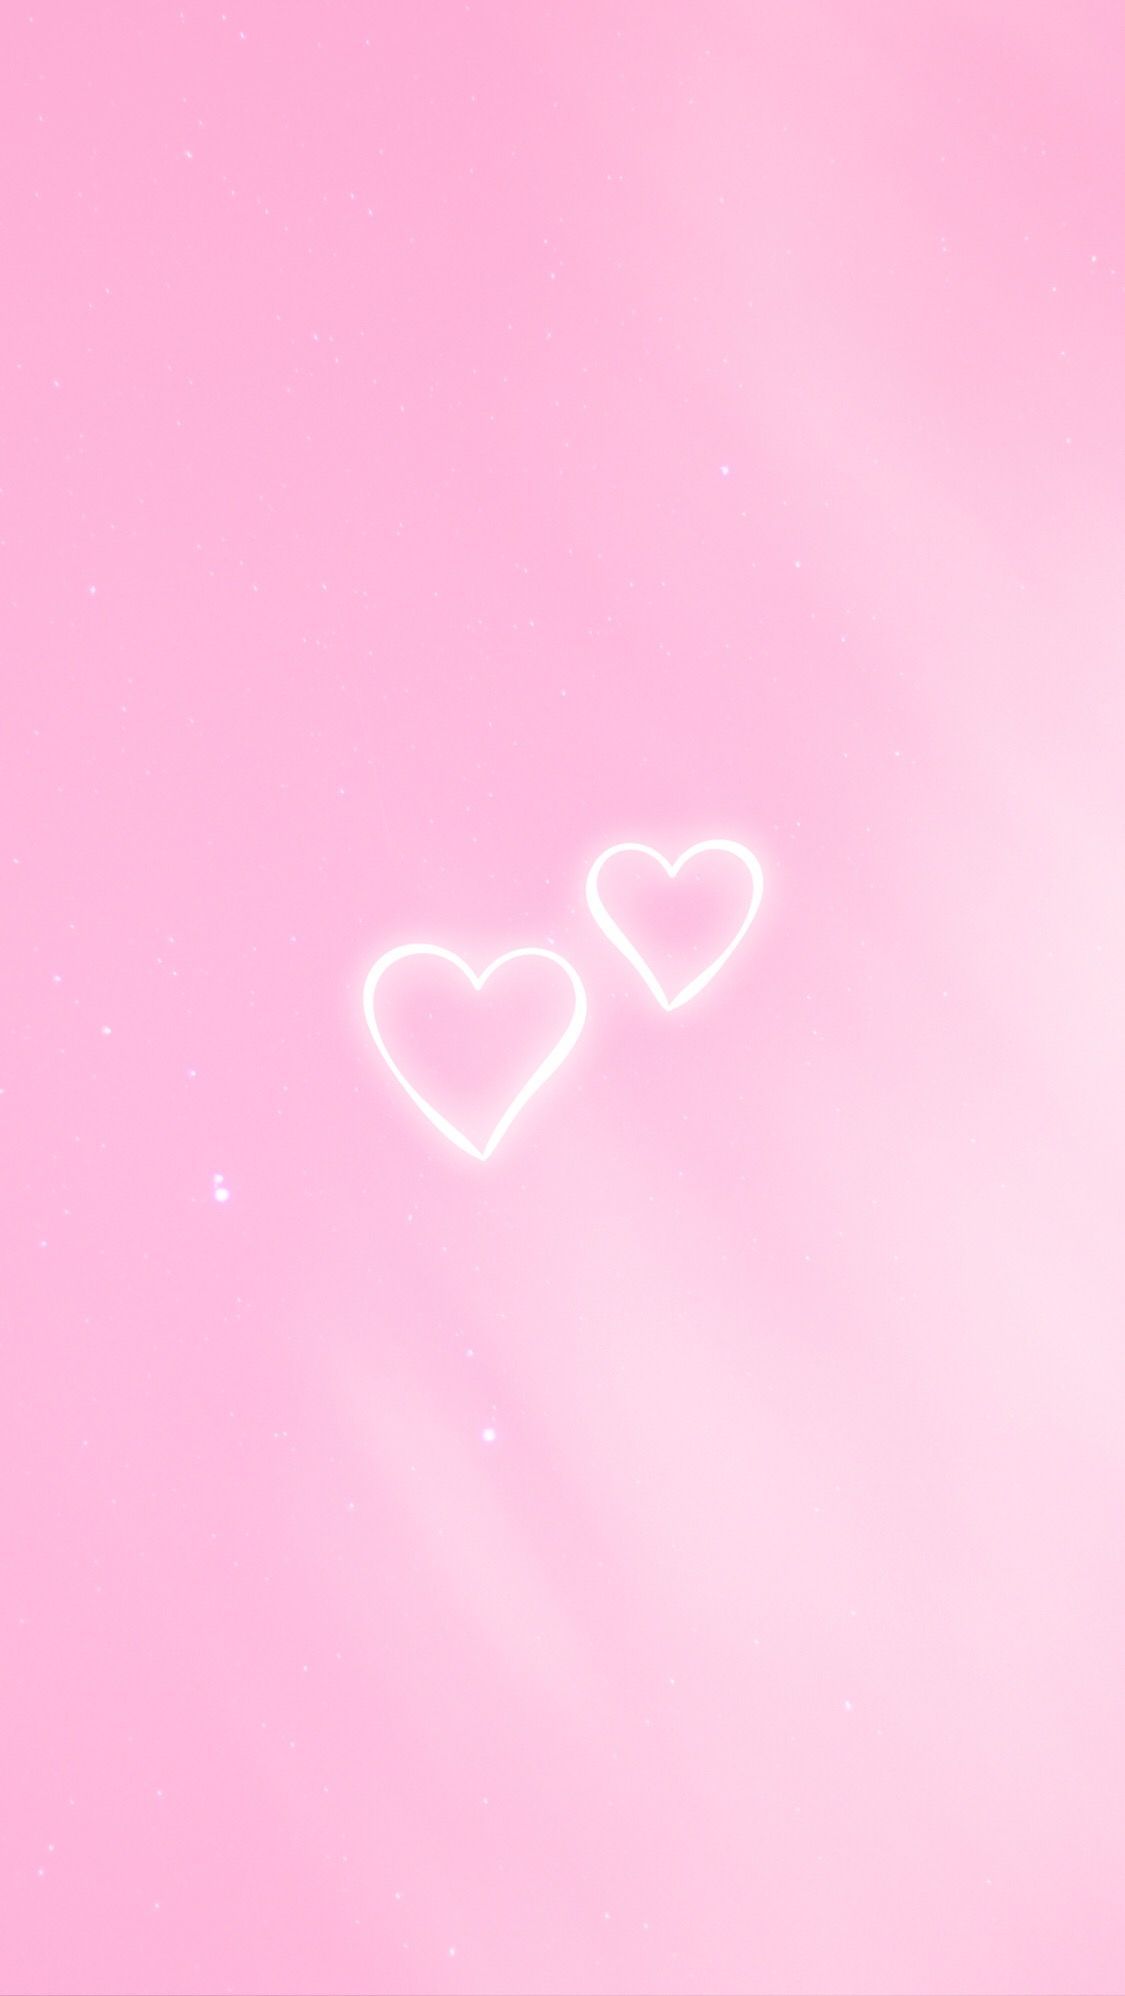 Wallpaper Wallpaperiphone Heart Heartswallpaper Heartwallpaper